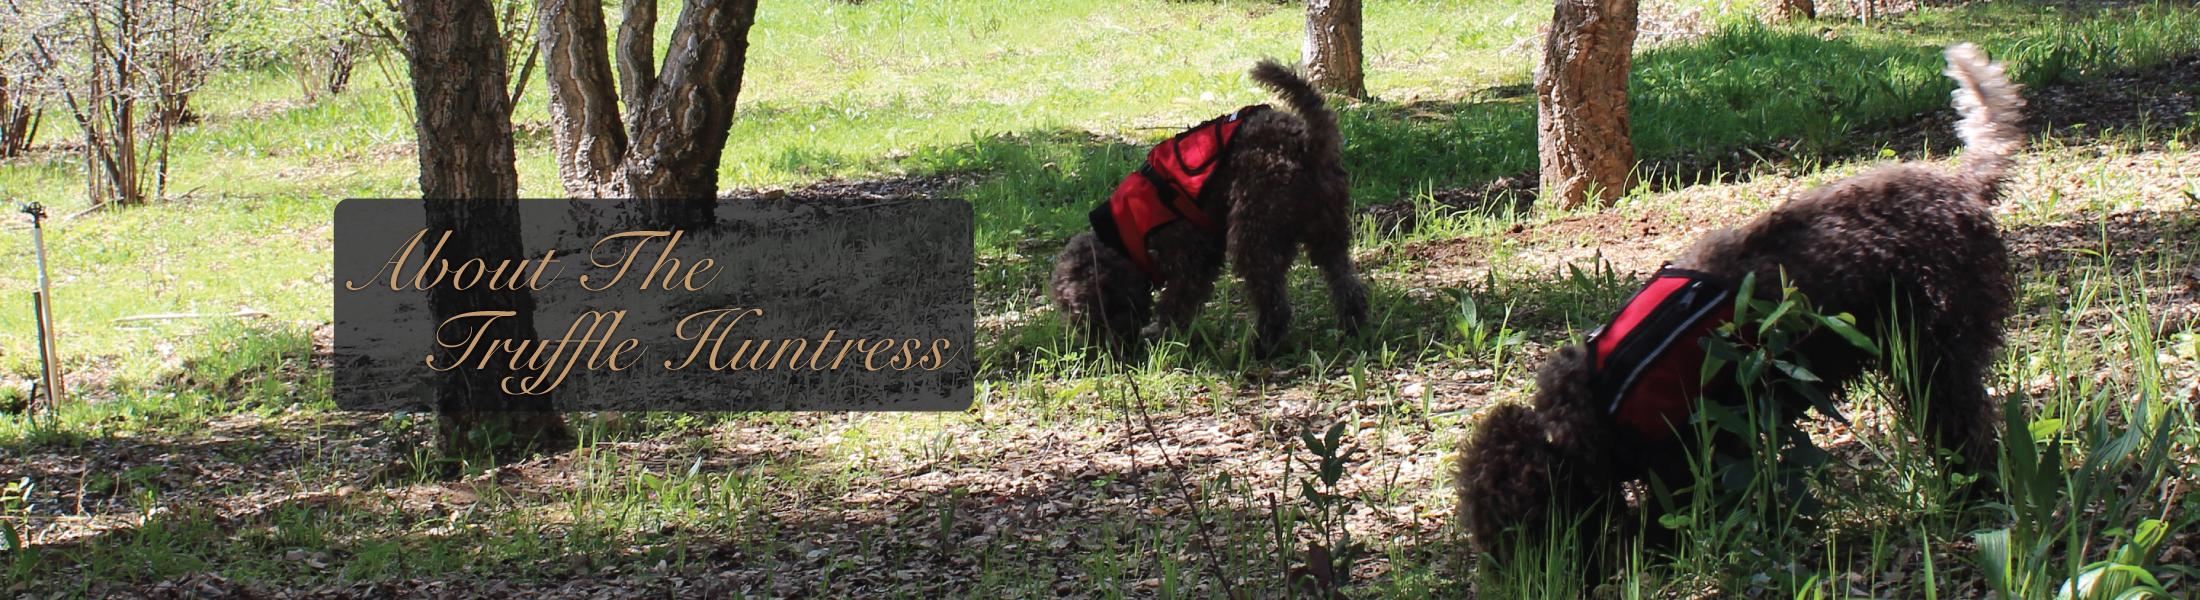 Mila The truffle Huntress